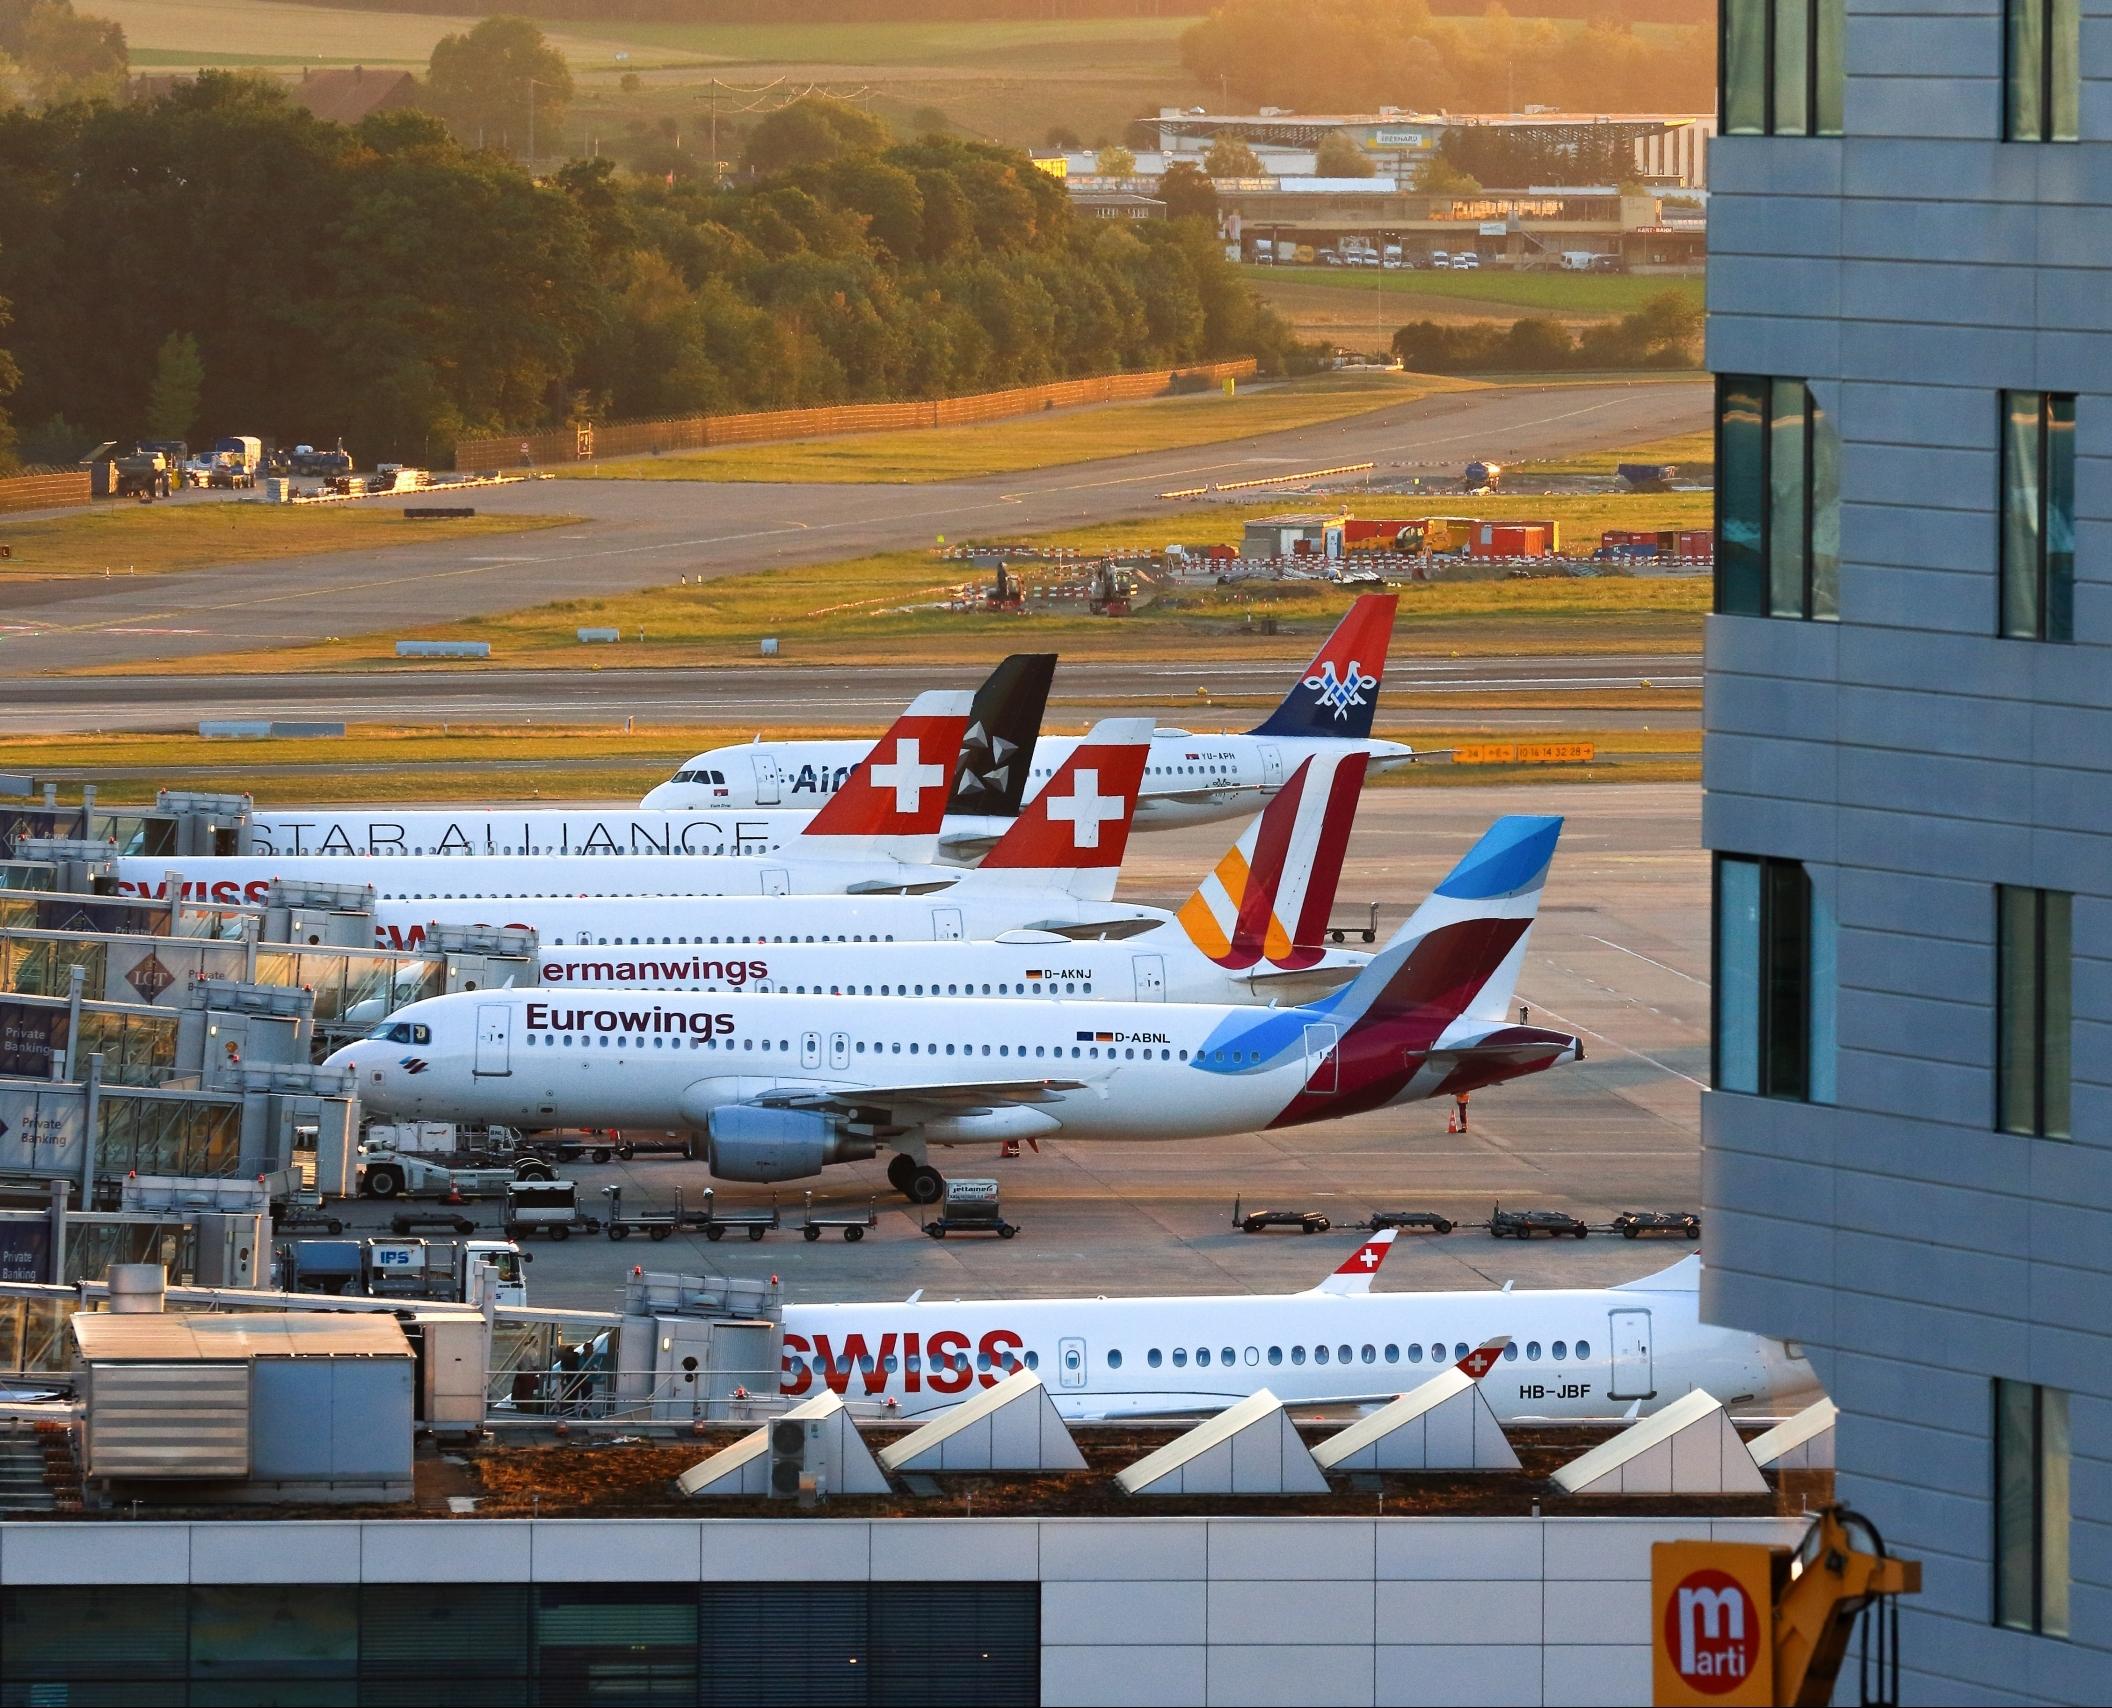 Eurowings sitze stabunednoi: Eurowings Discover